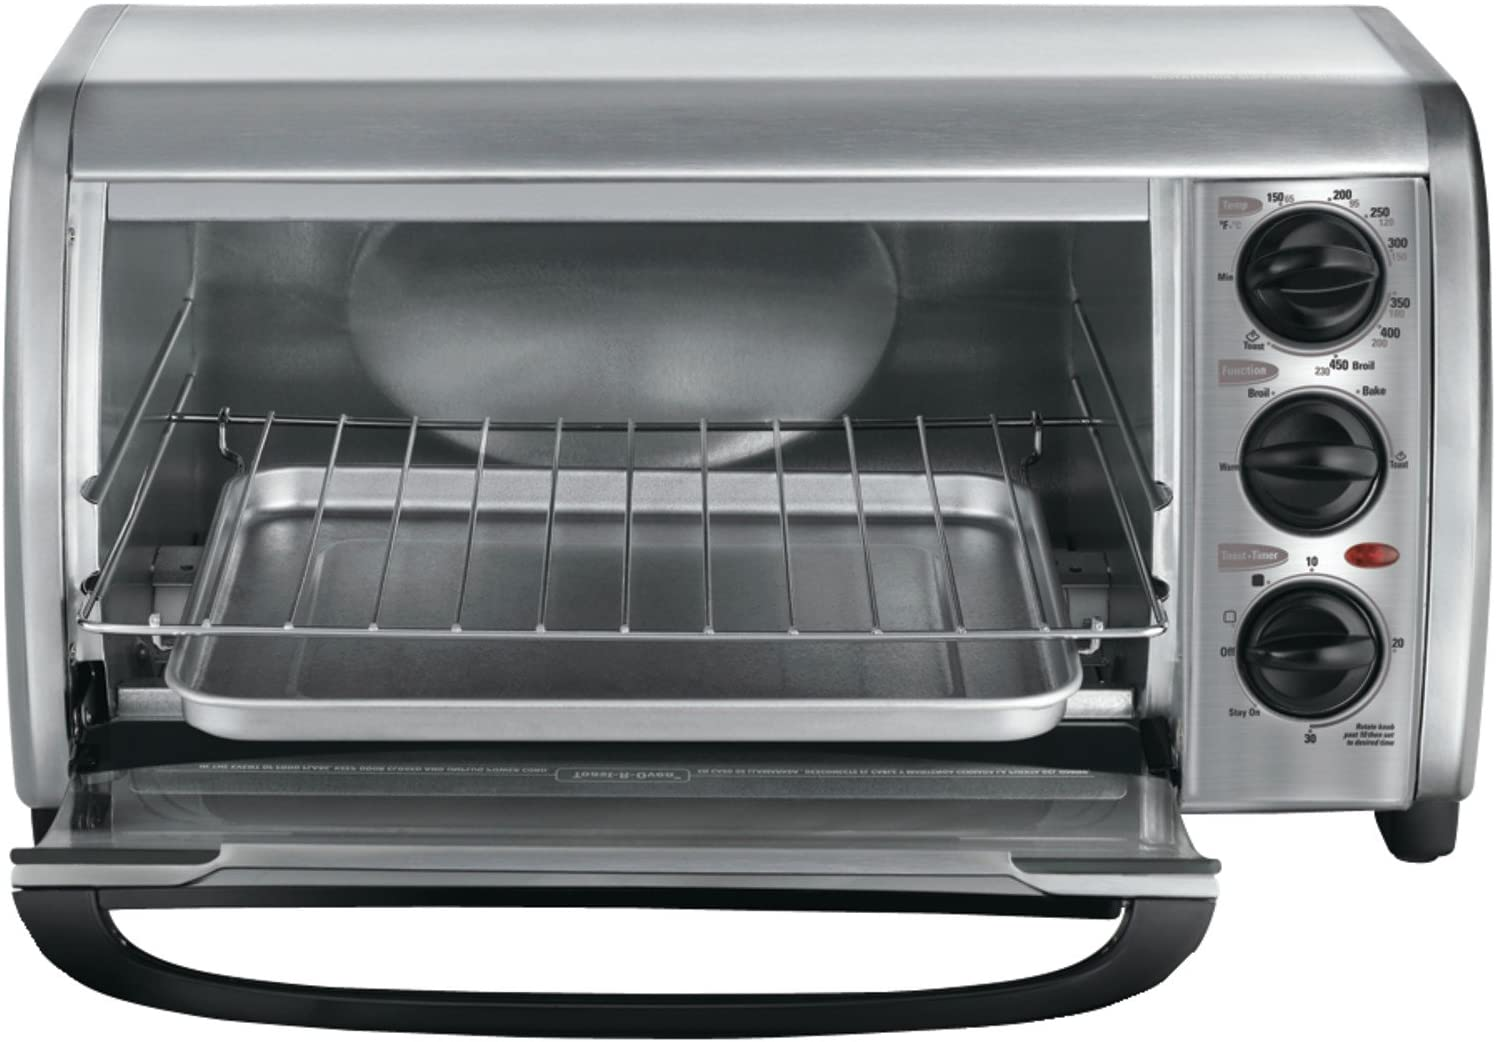 Black & Decker Black & Decker TO1491S-2 4-Slice Toaster Oven